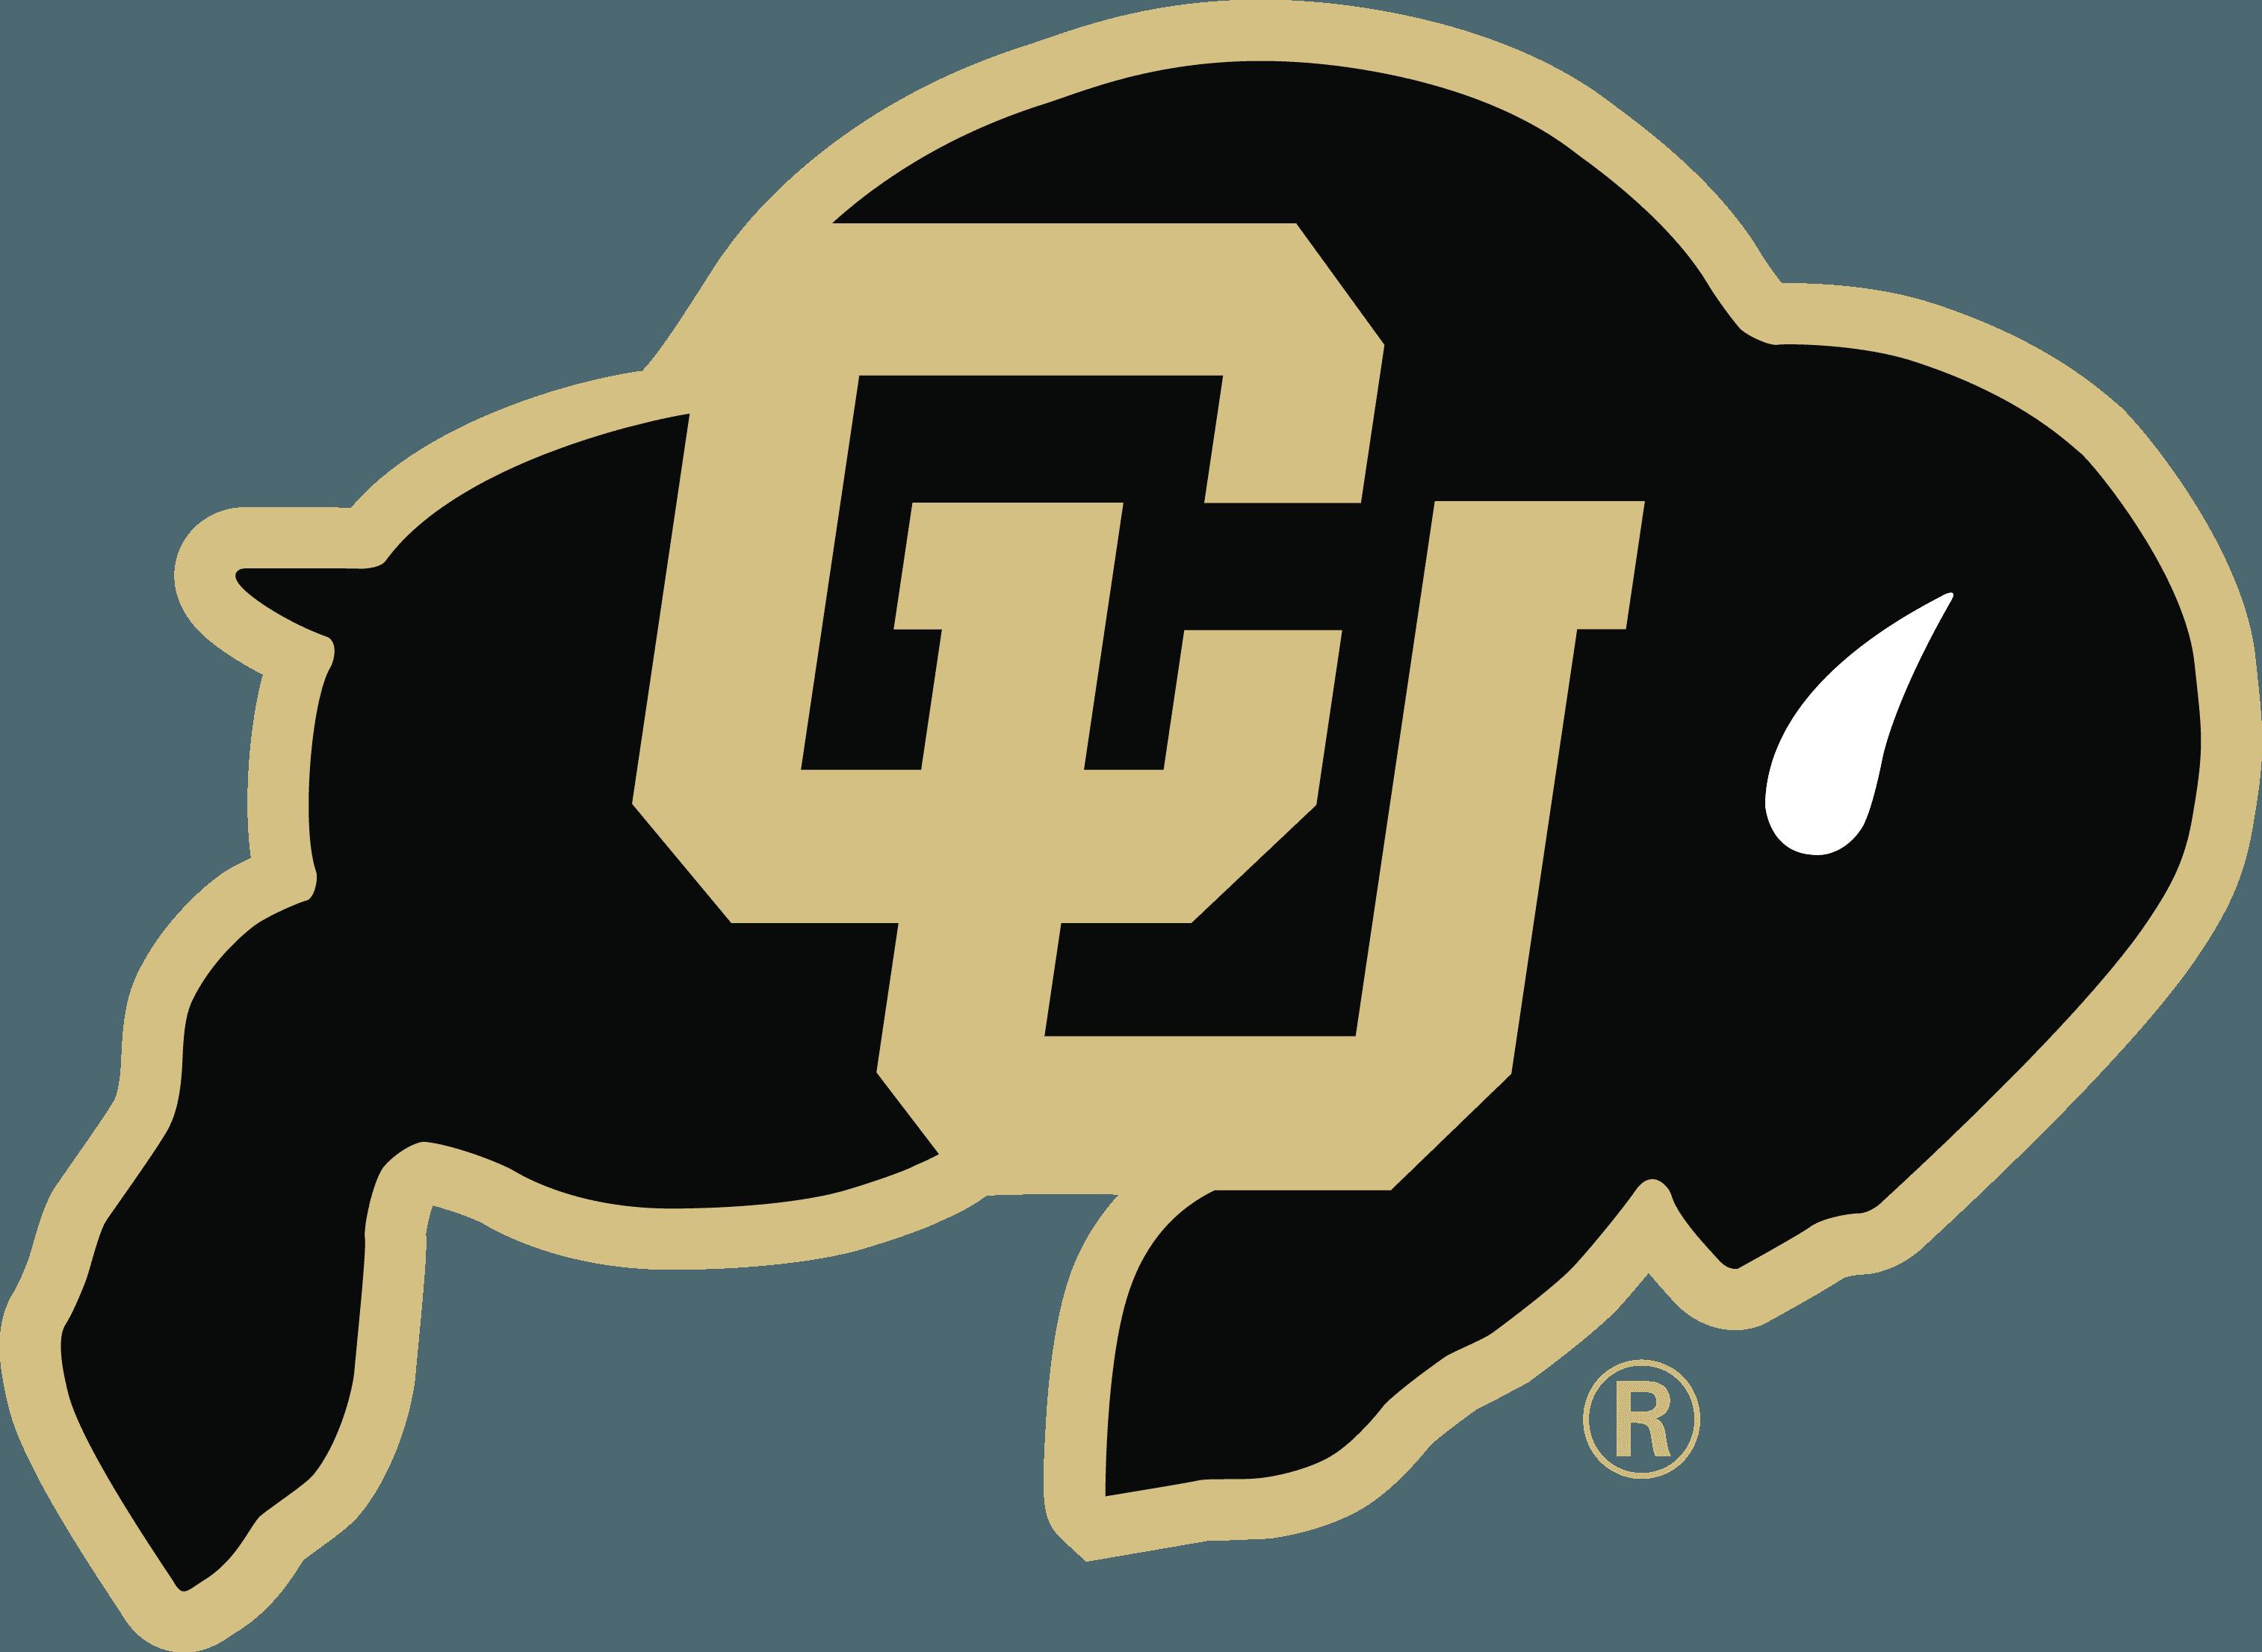 Colorado Buffaloes Logo [PDF] Vector EPS Free Download, Logo, Icons, Brand Emblems